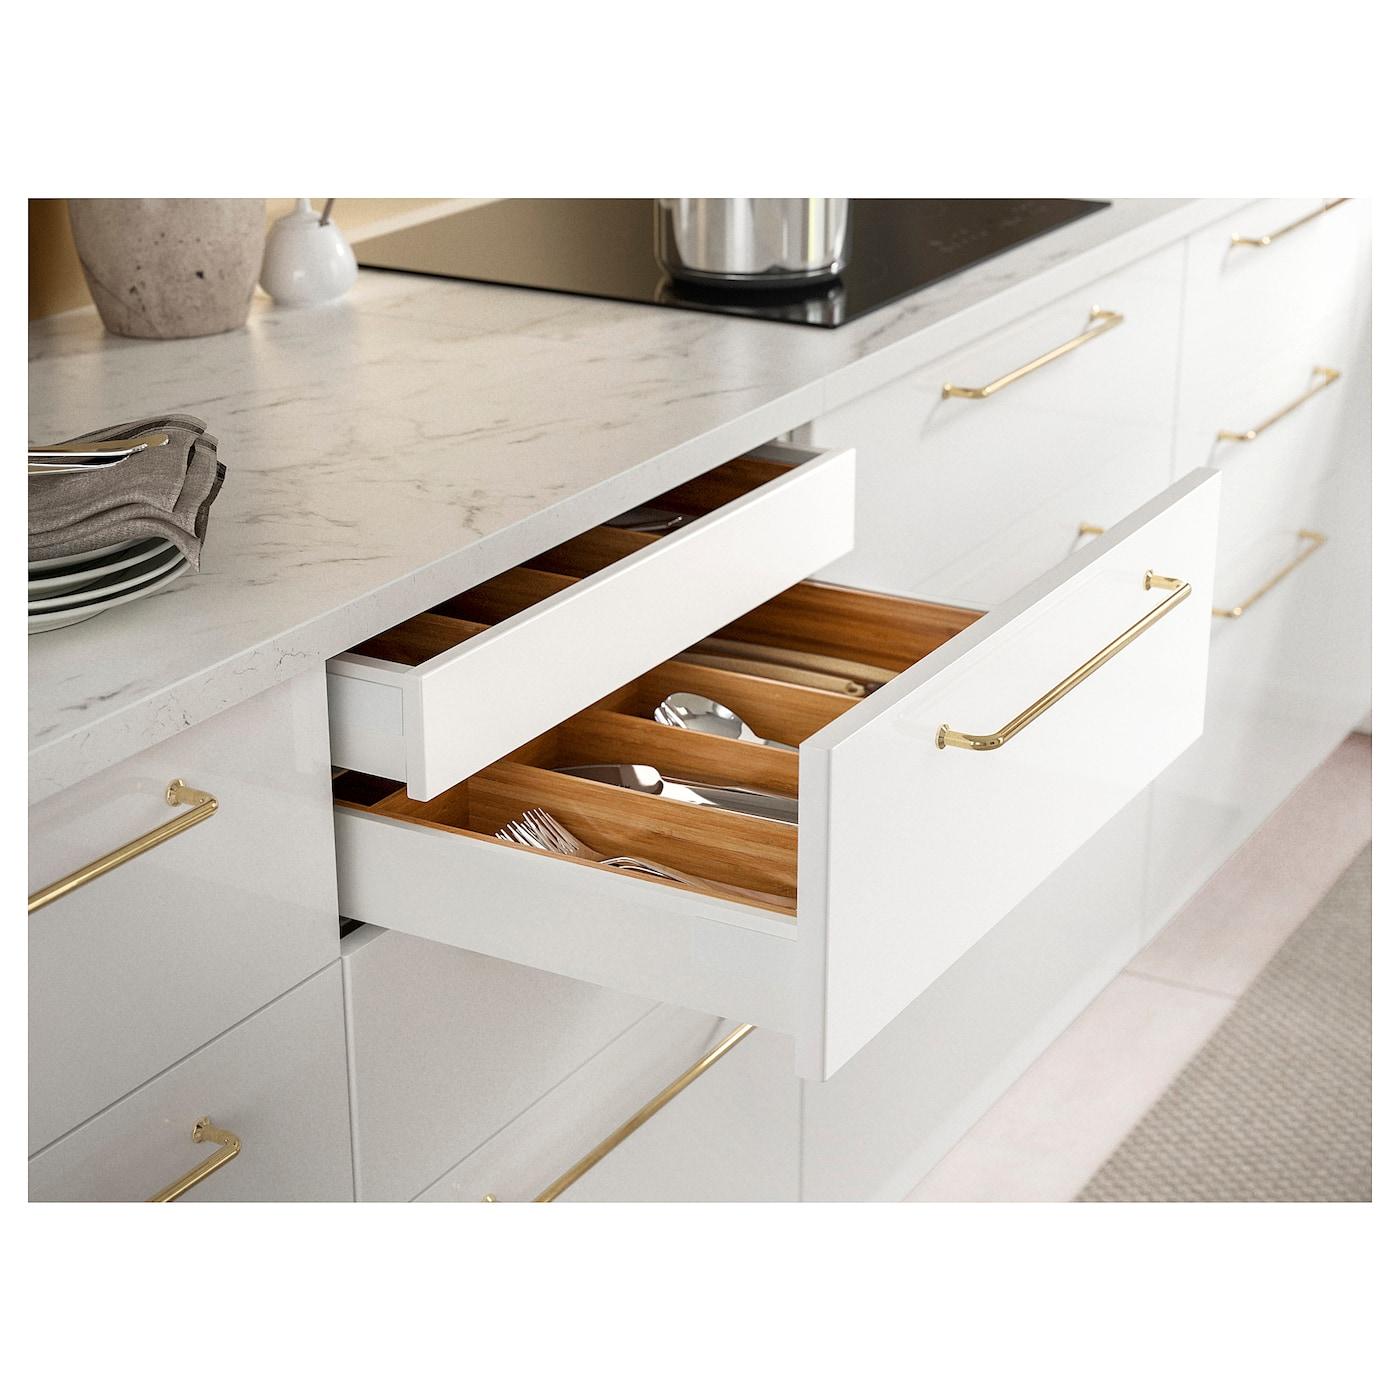 Ekbacken Countertop White Marble Effect Laminate 74x11 8 188x2 8 Cm Ikea